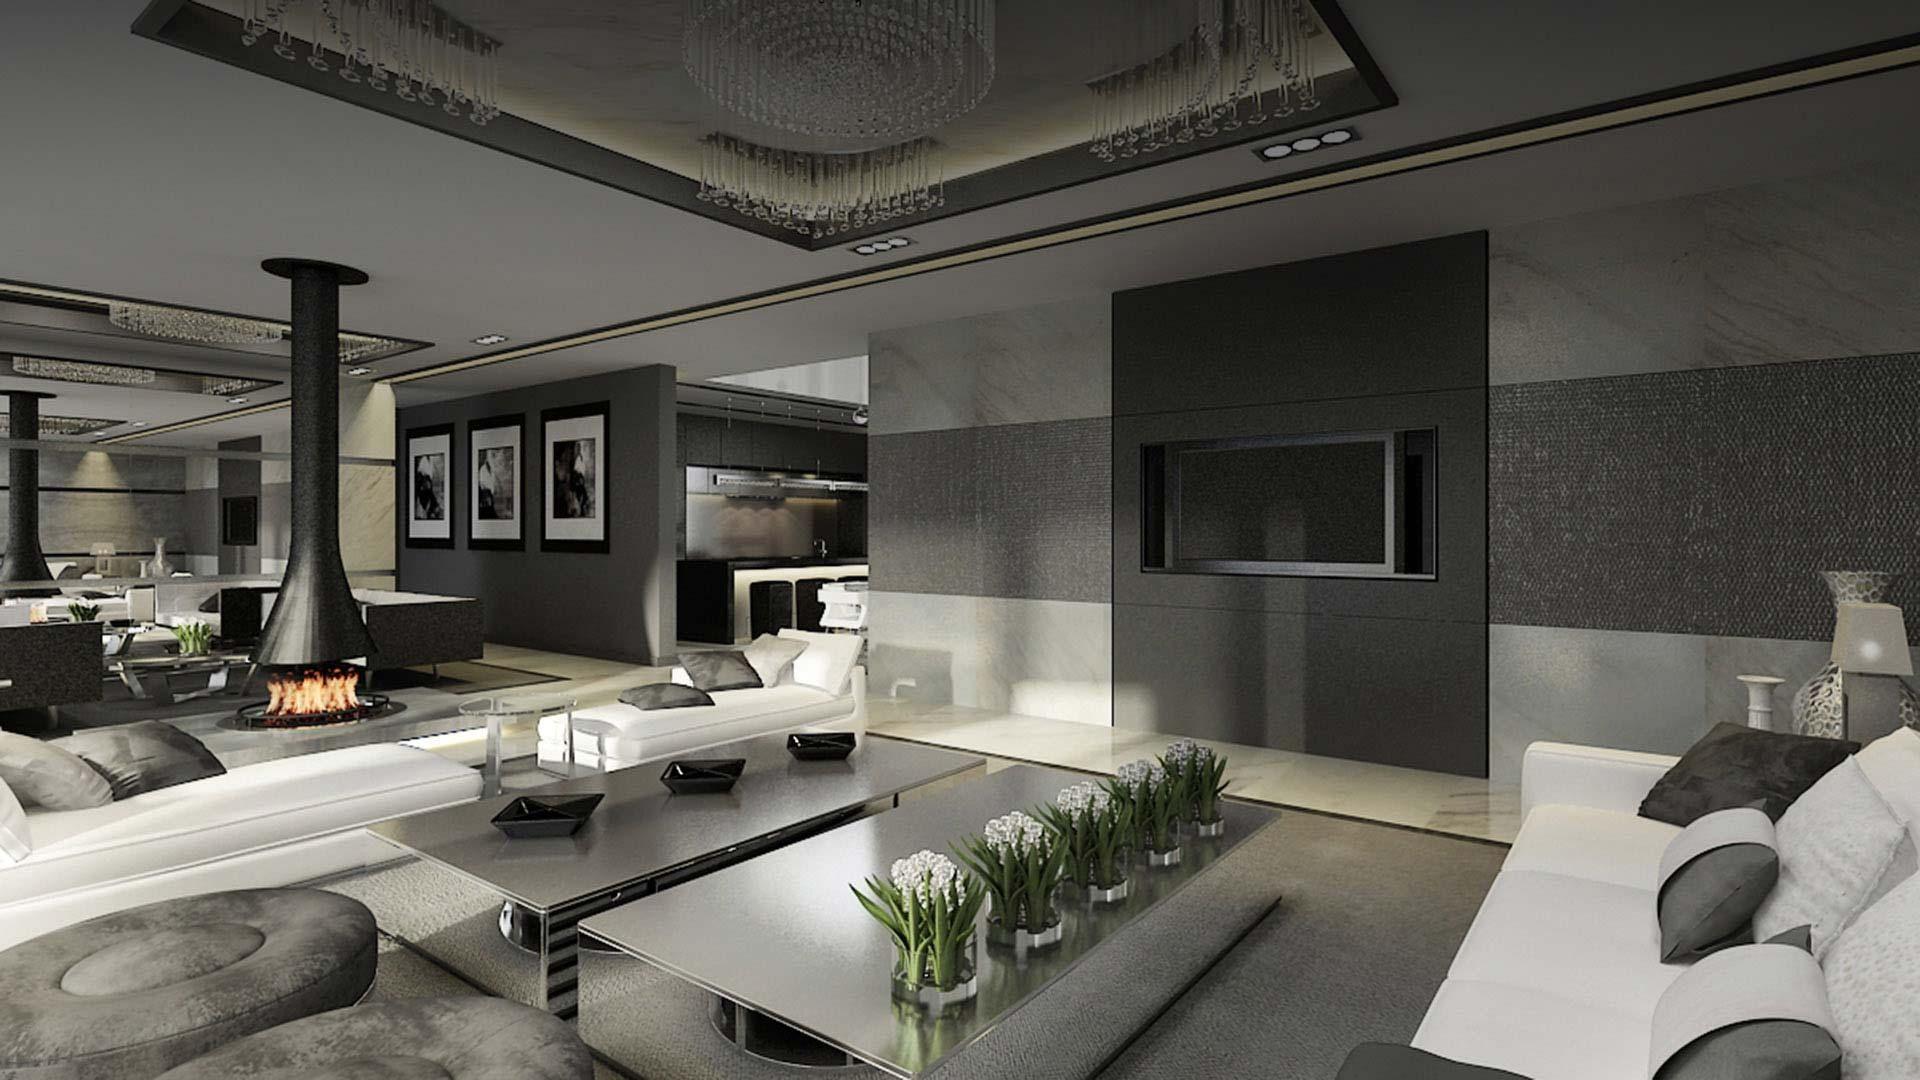 15 Top Modern House Interior Designs For 2019 Interiores